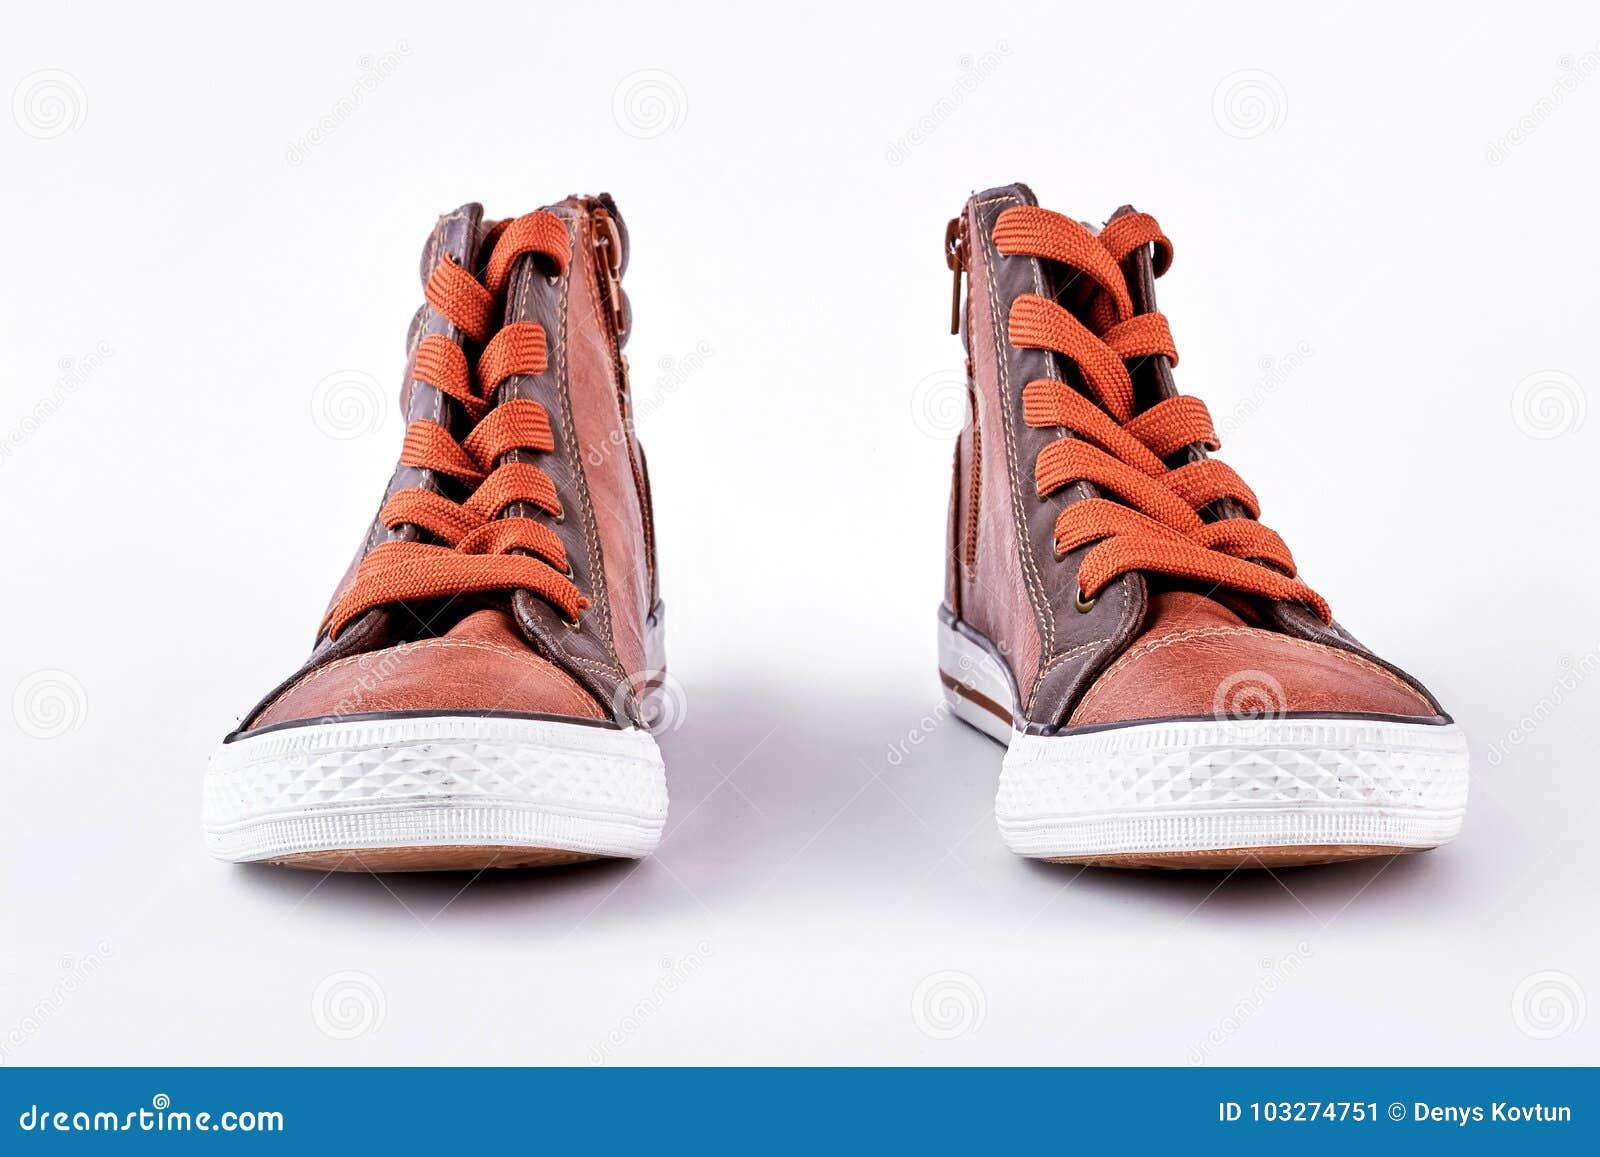 454f5ba49eac Fashion Sport Sneakers